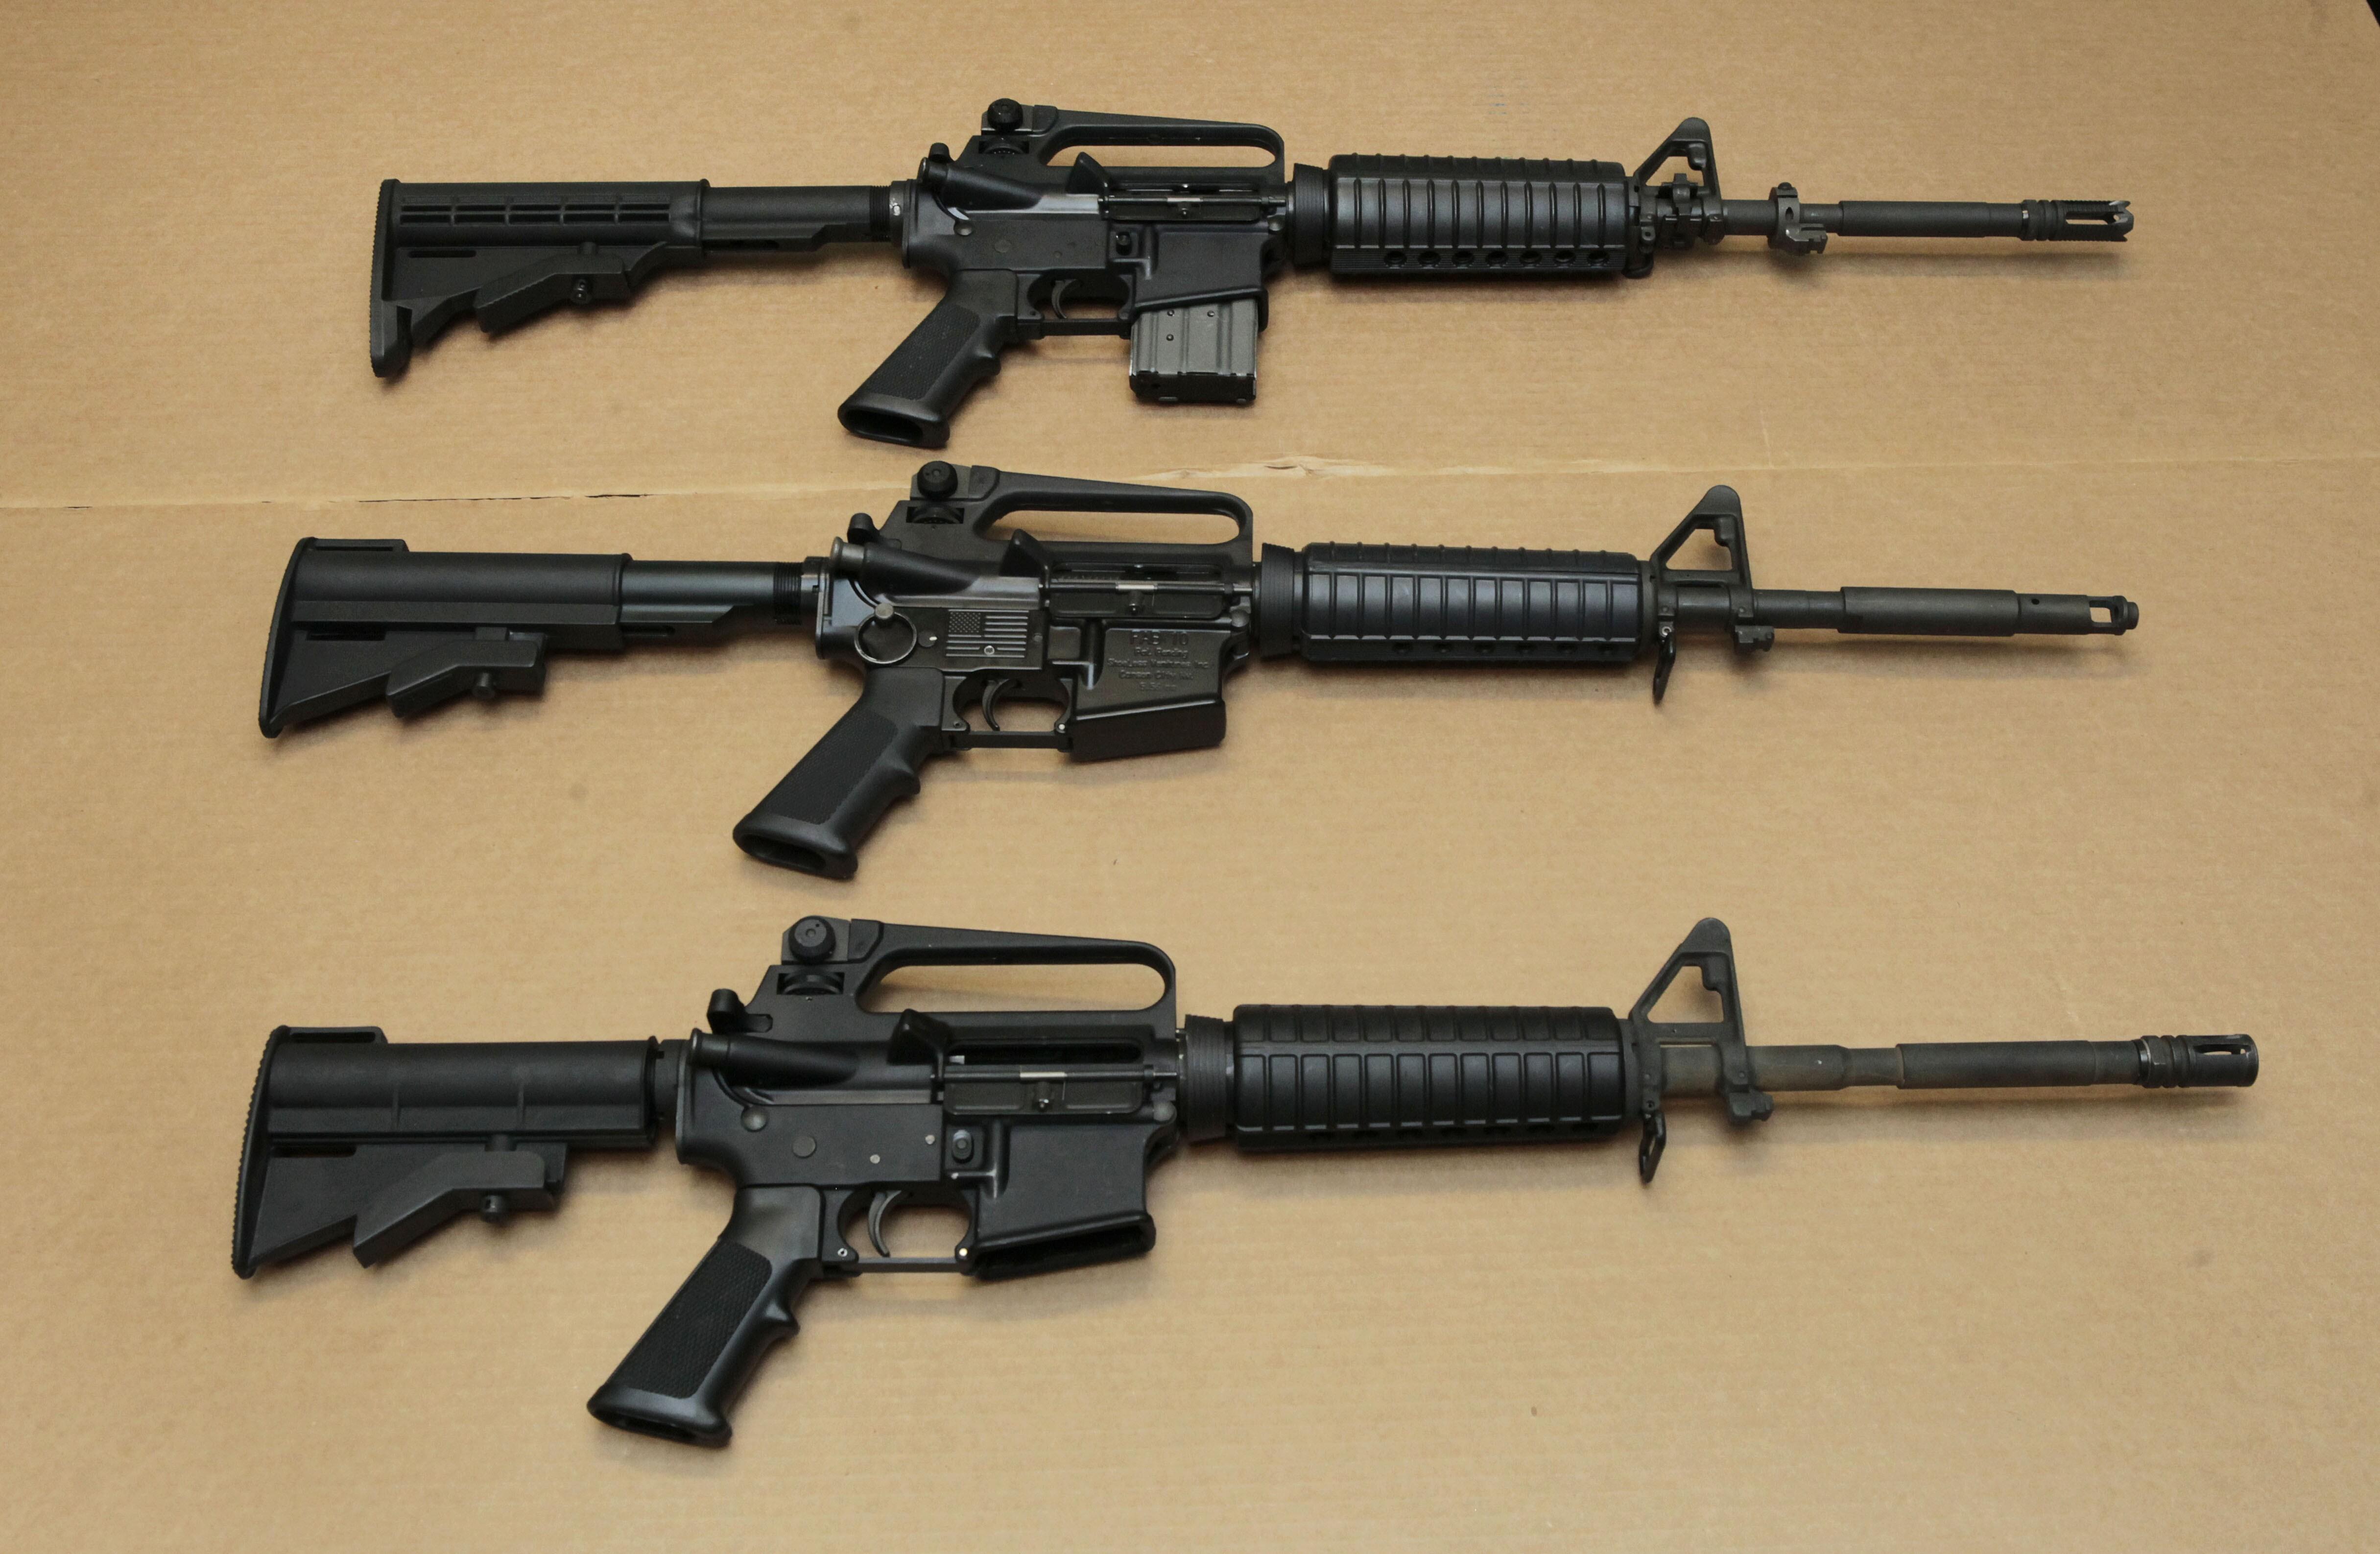 why it's a 'modern sporting rifle,' not an 'assault weapon'